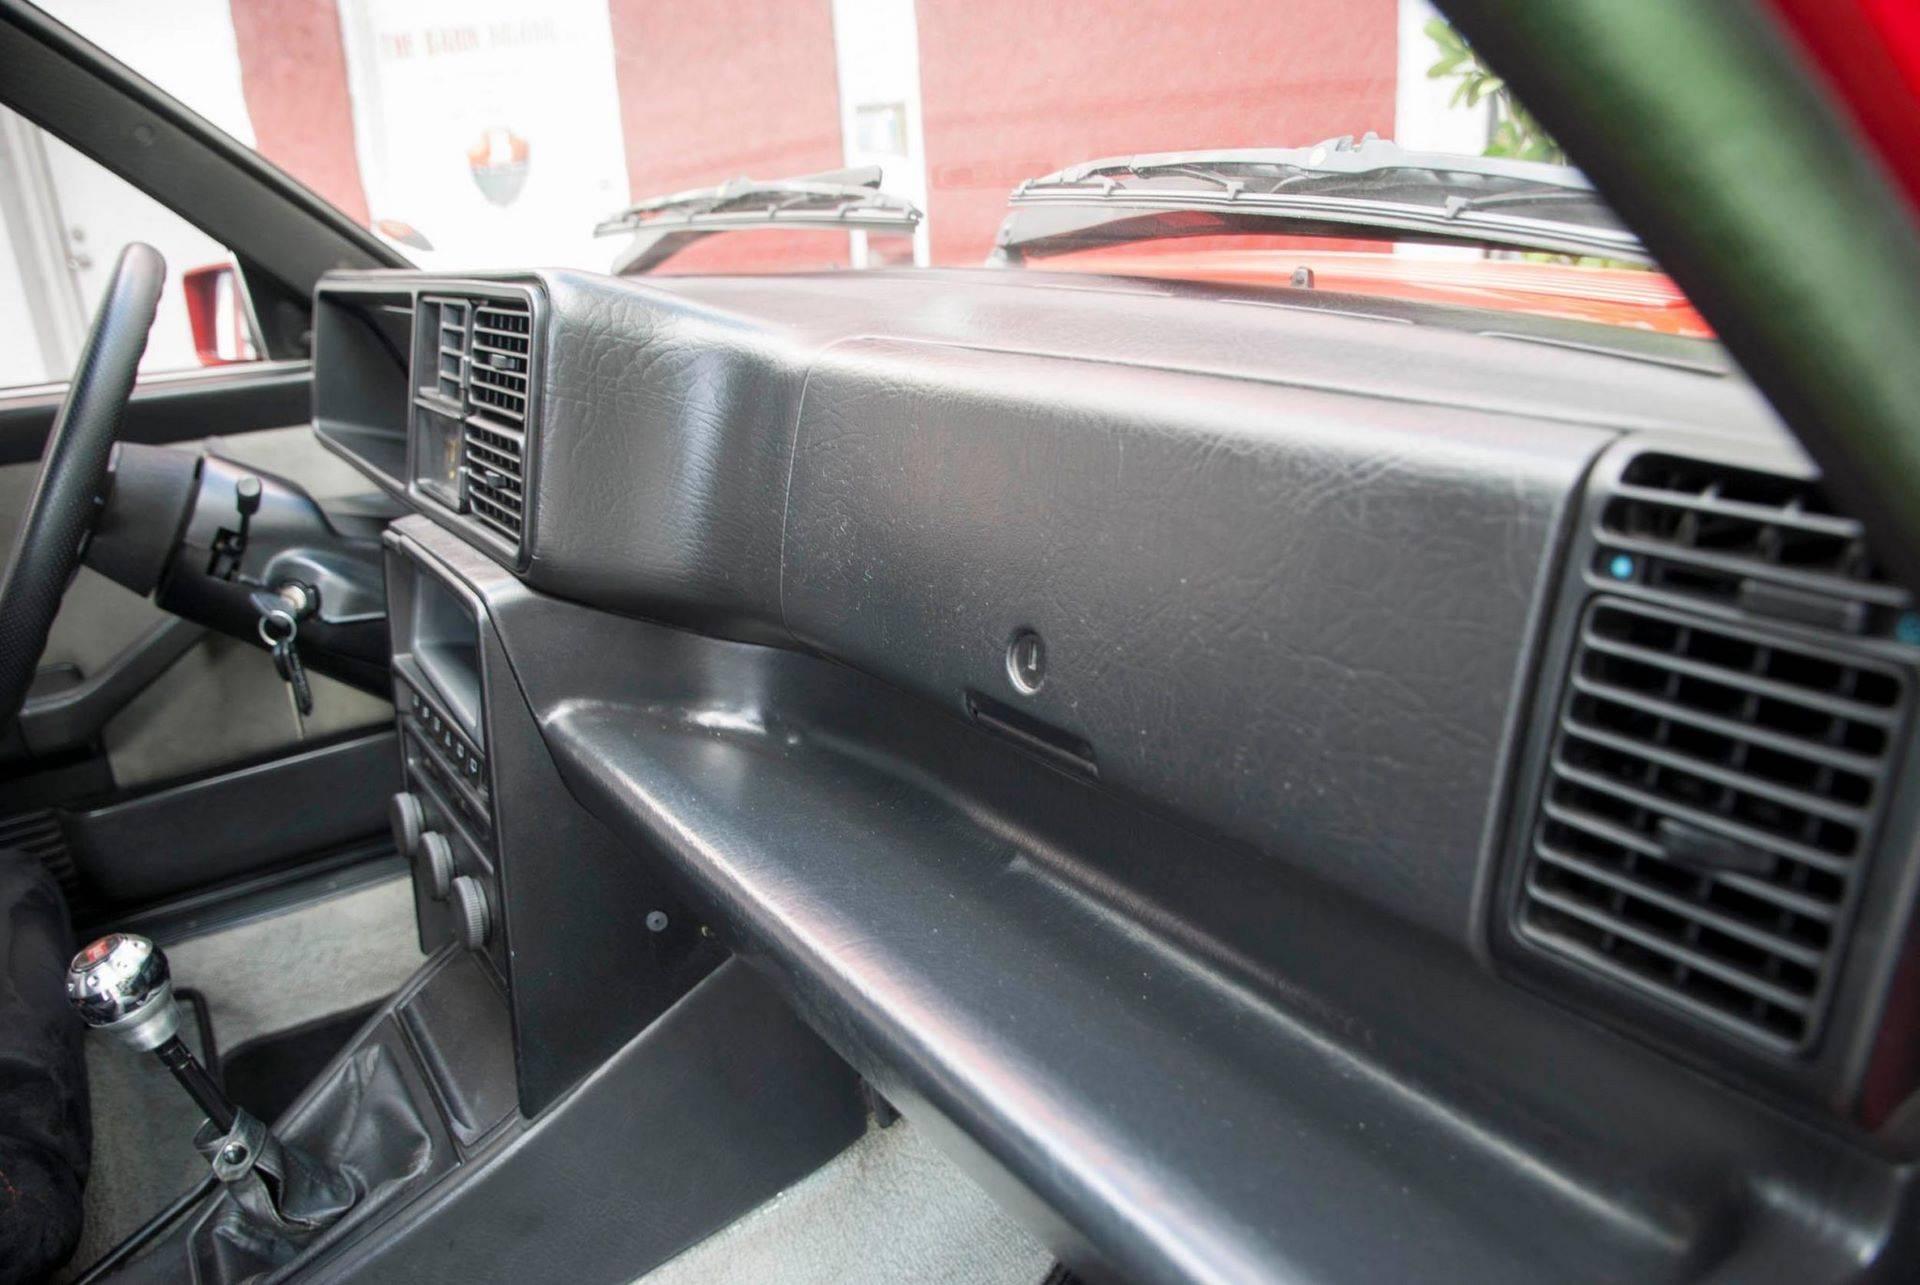 Lancia-Delta-Integrale-8V-1989-46